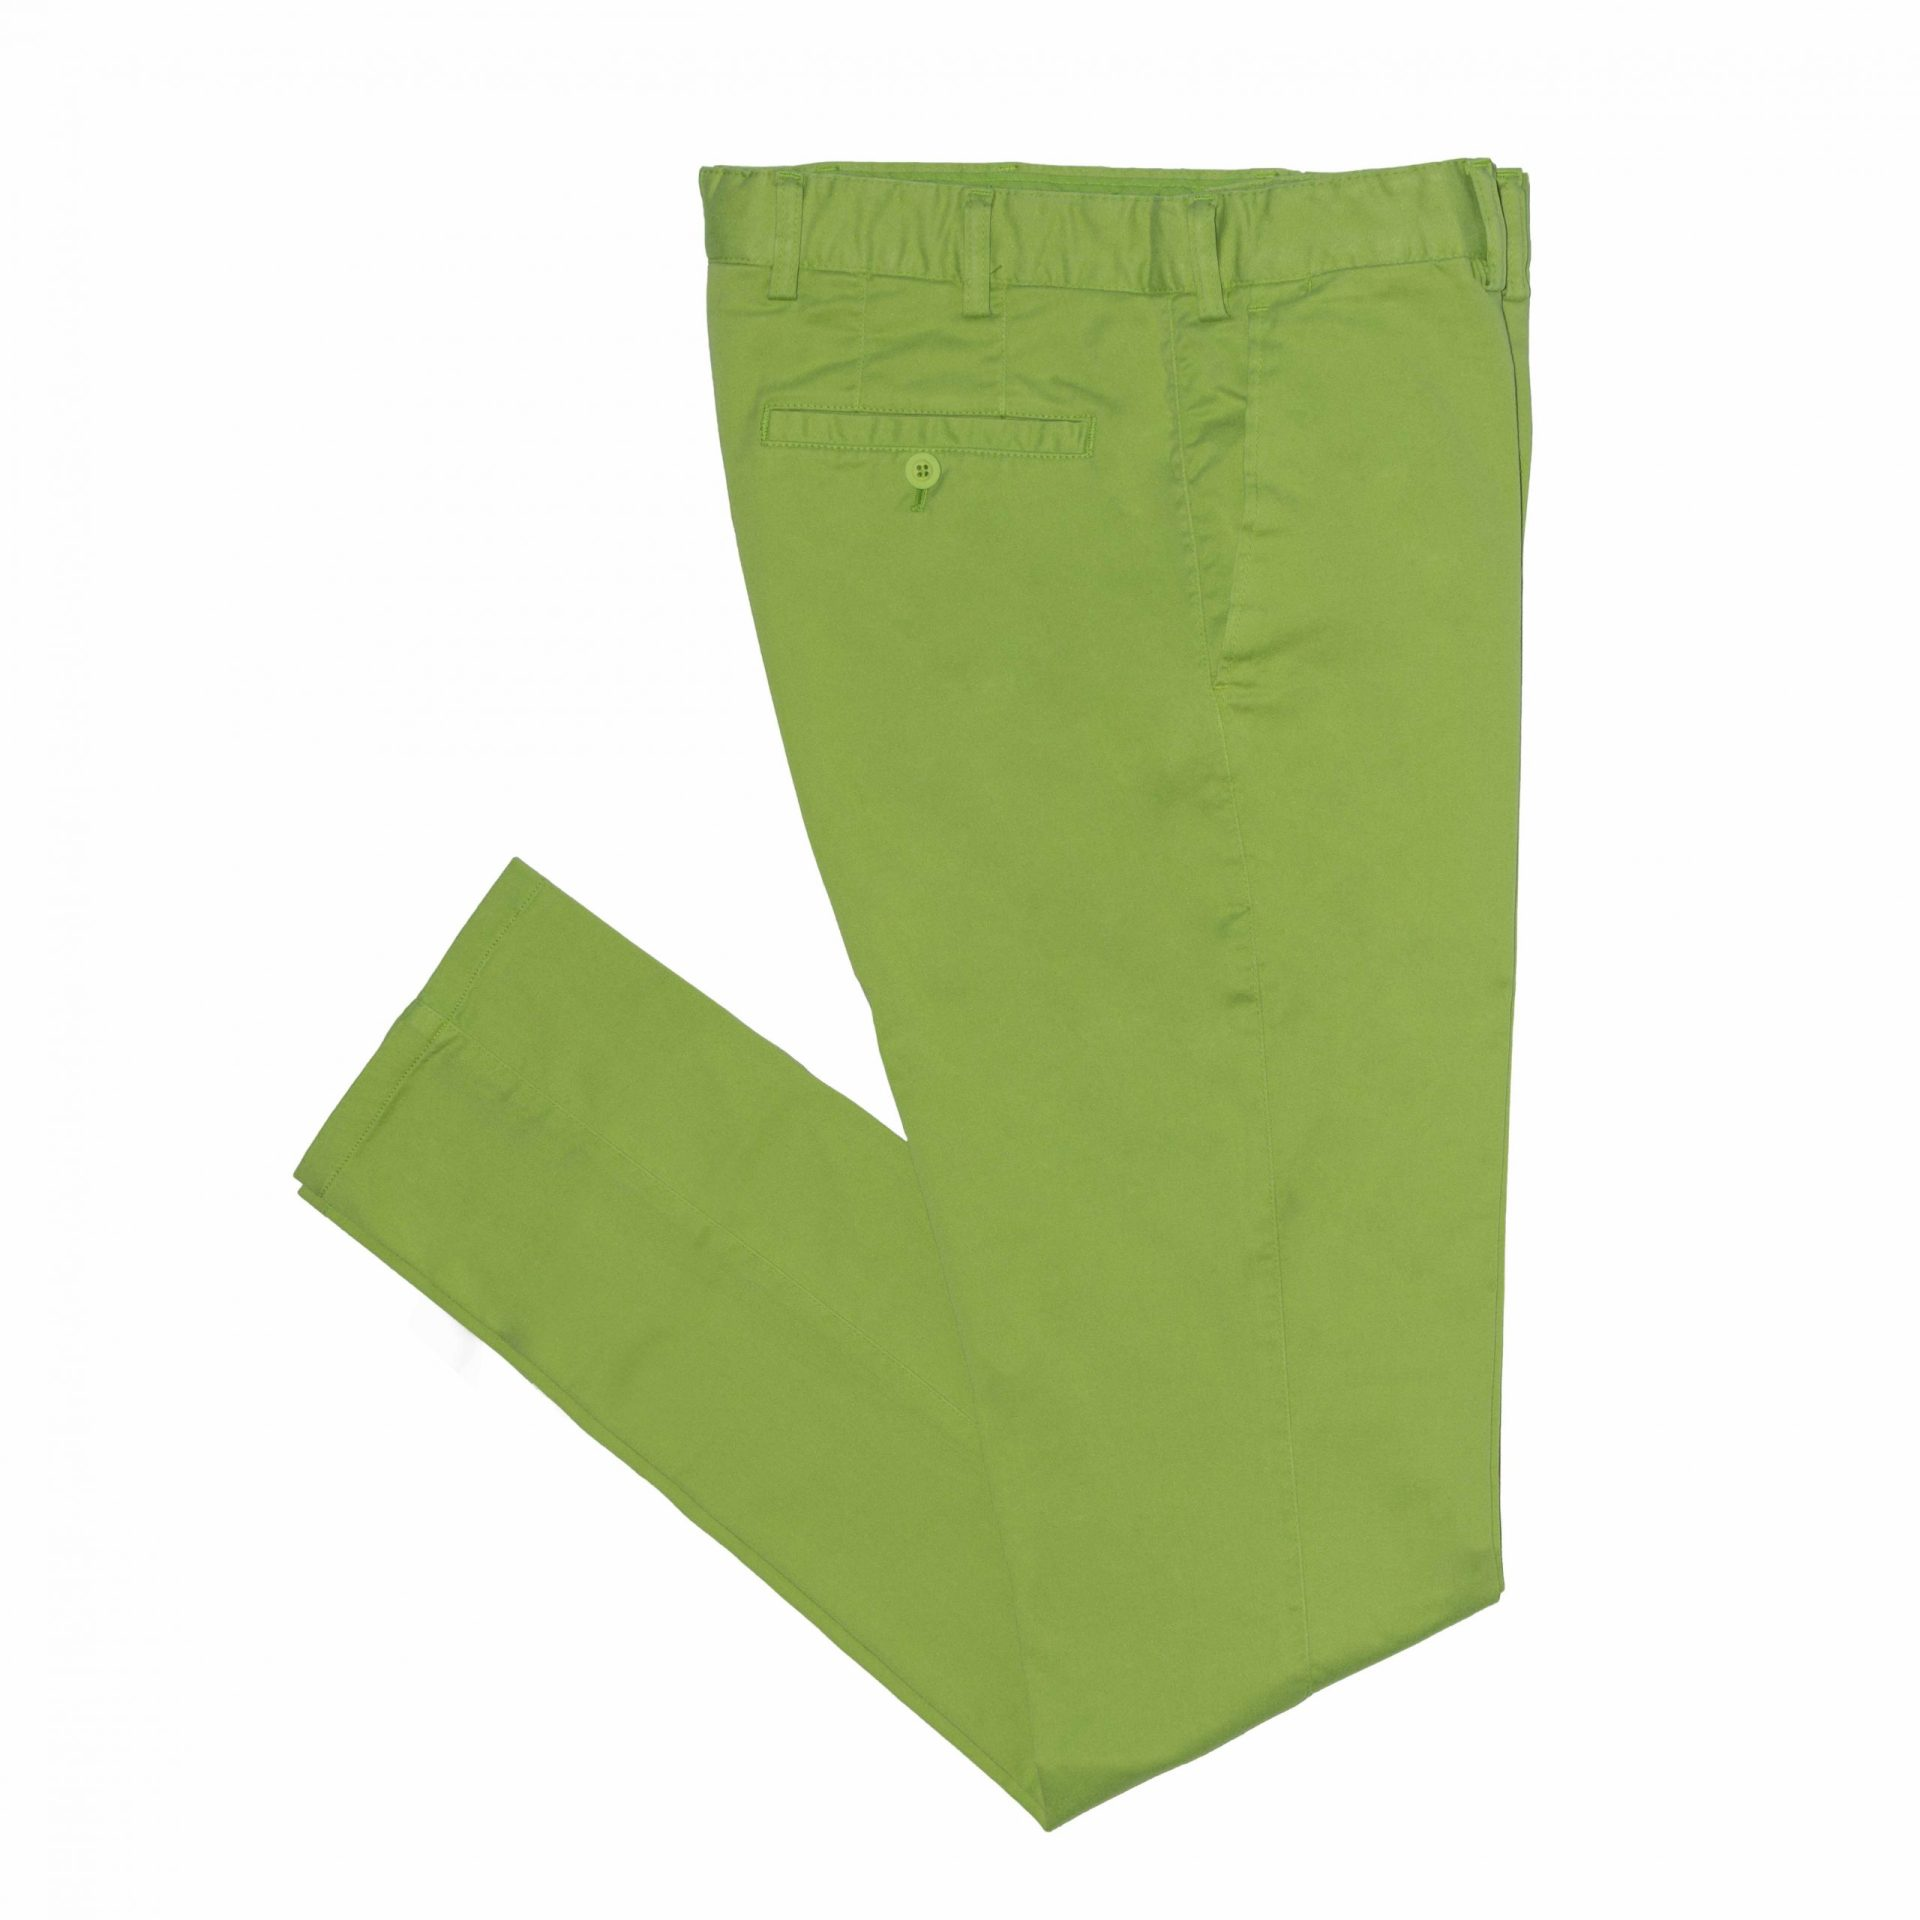 JAGGS-chinos-pret-a-porter-summer-edition-vert-pomme